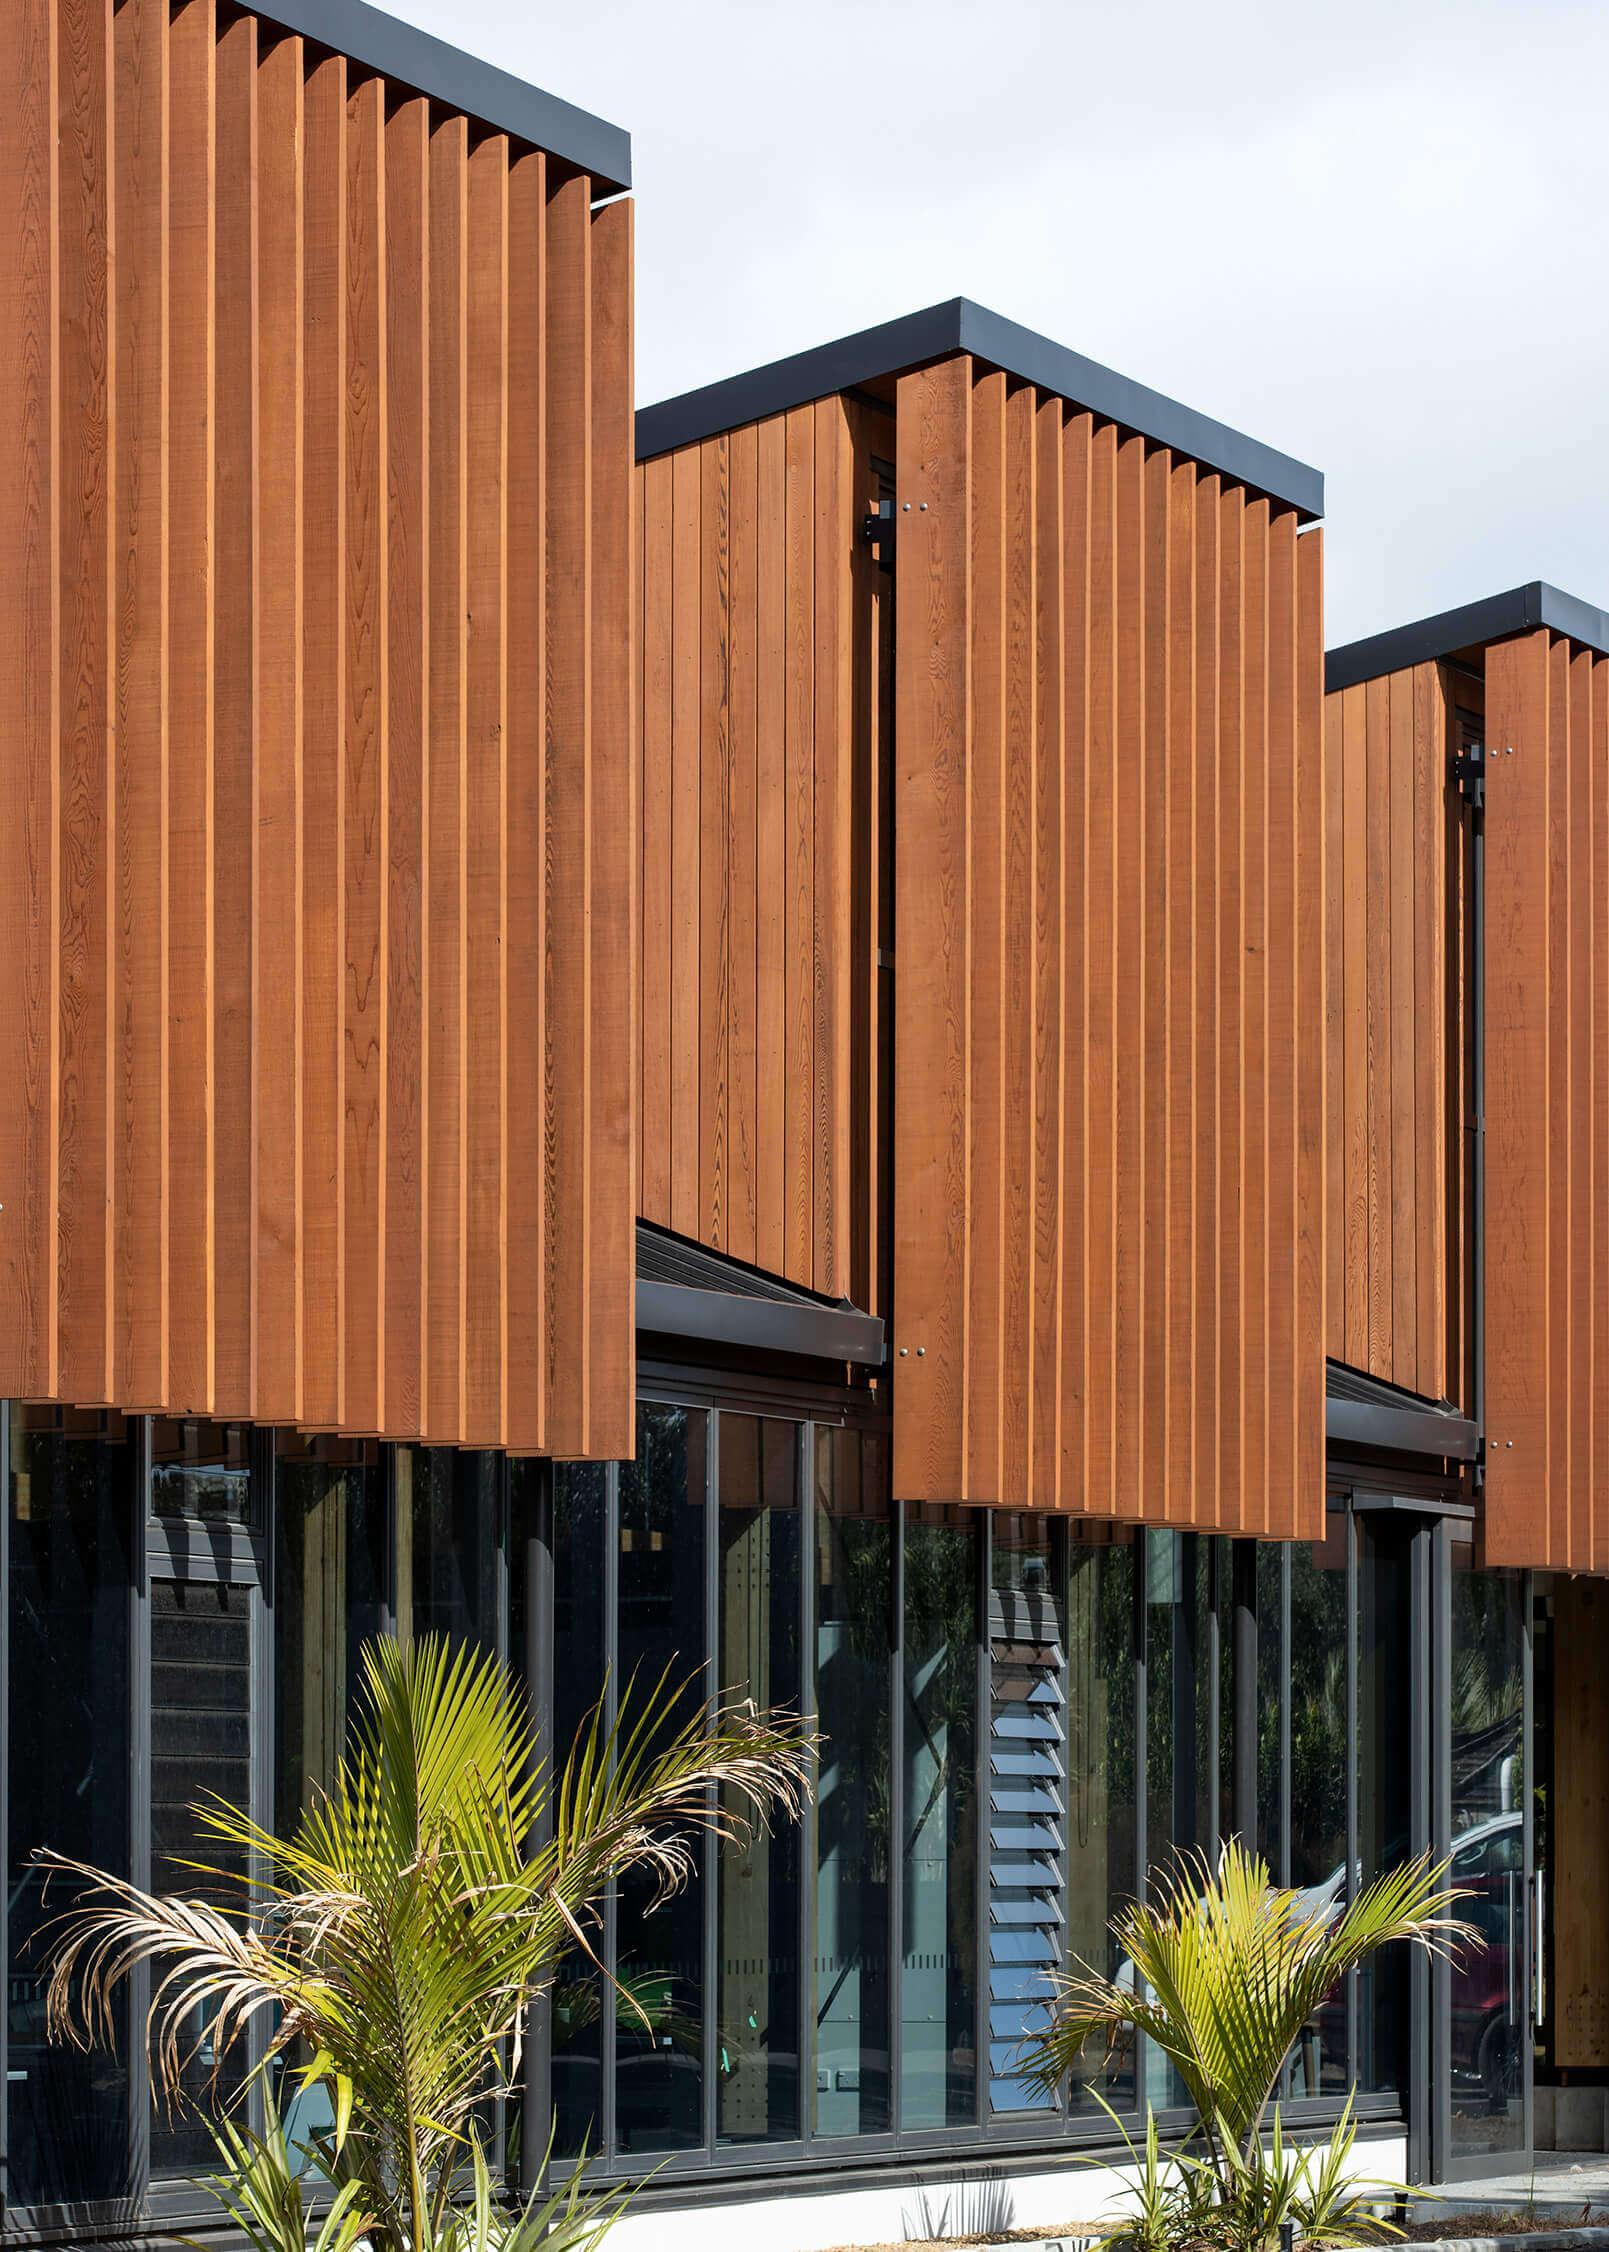 Cedar screens provide shading for the building's interior